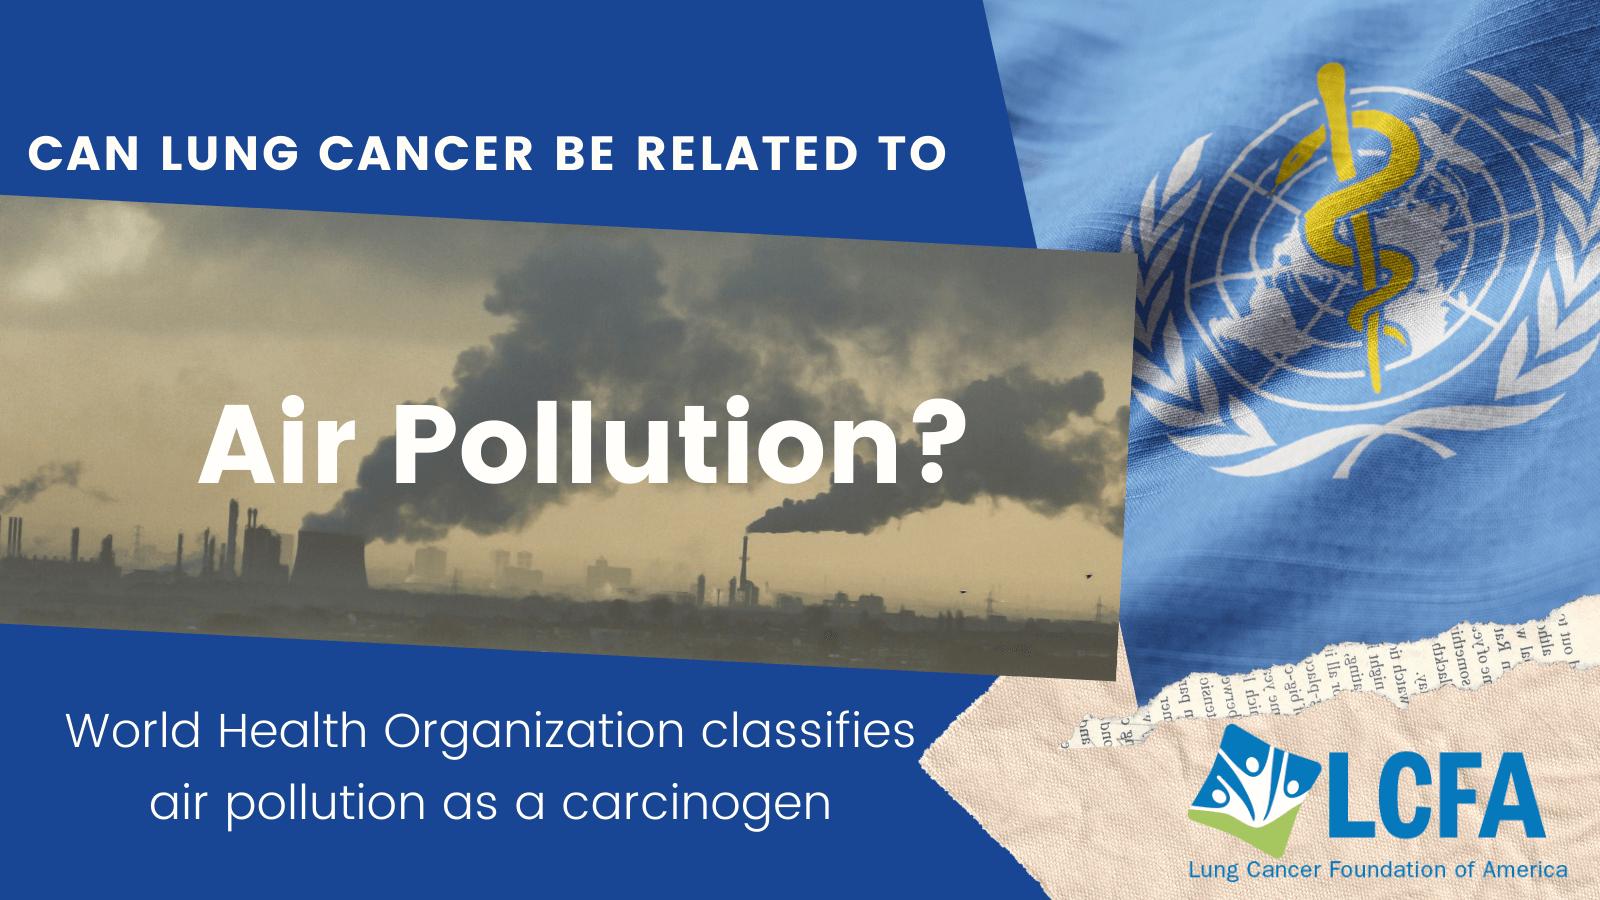 World Health Organization classifies air pollution as a carcinogen